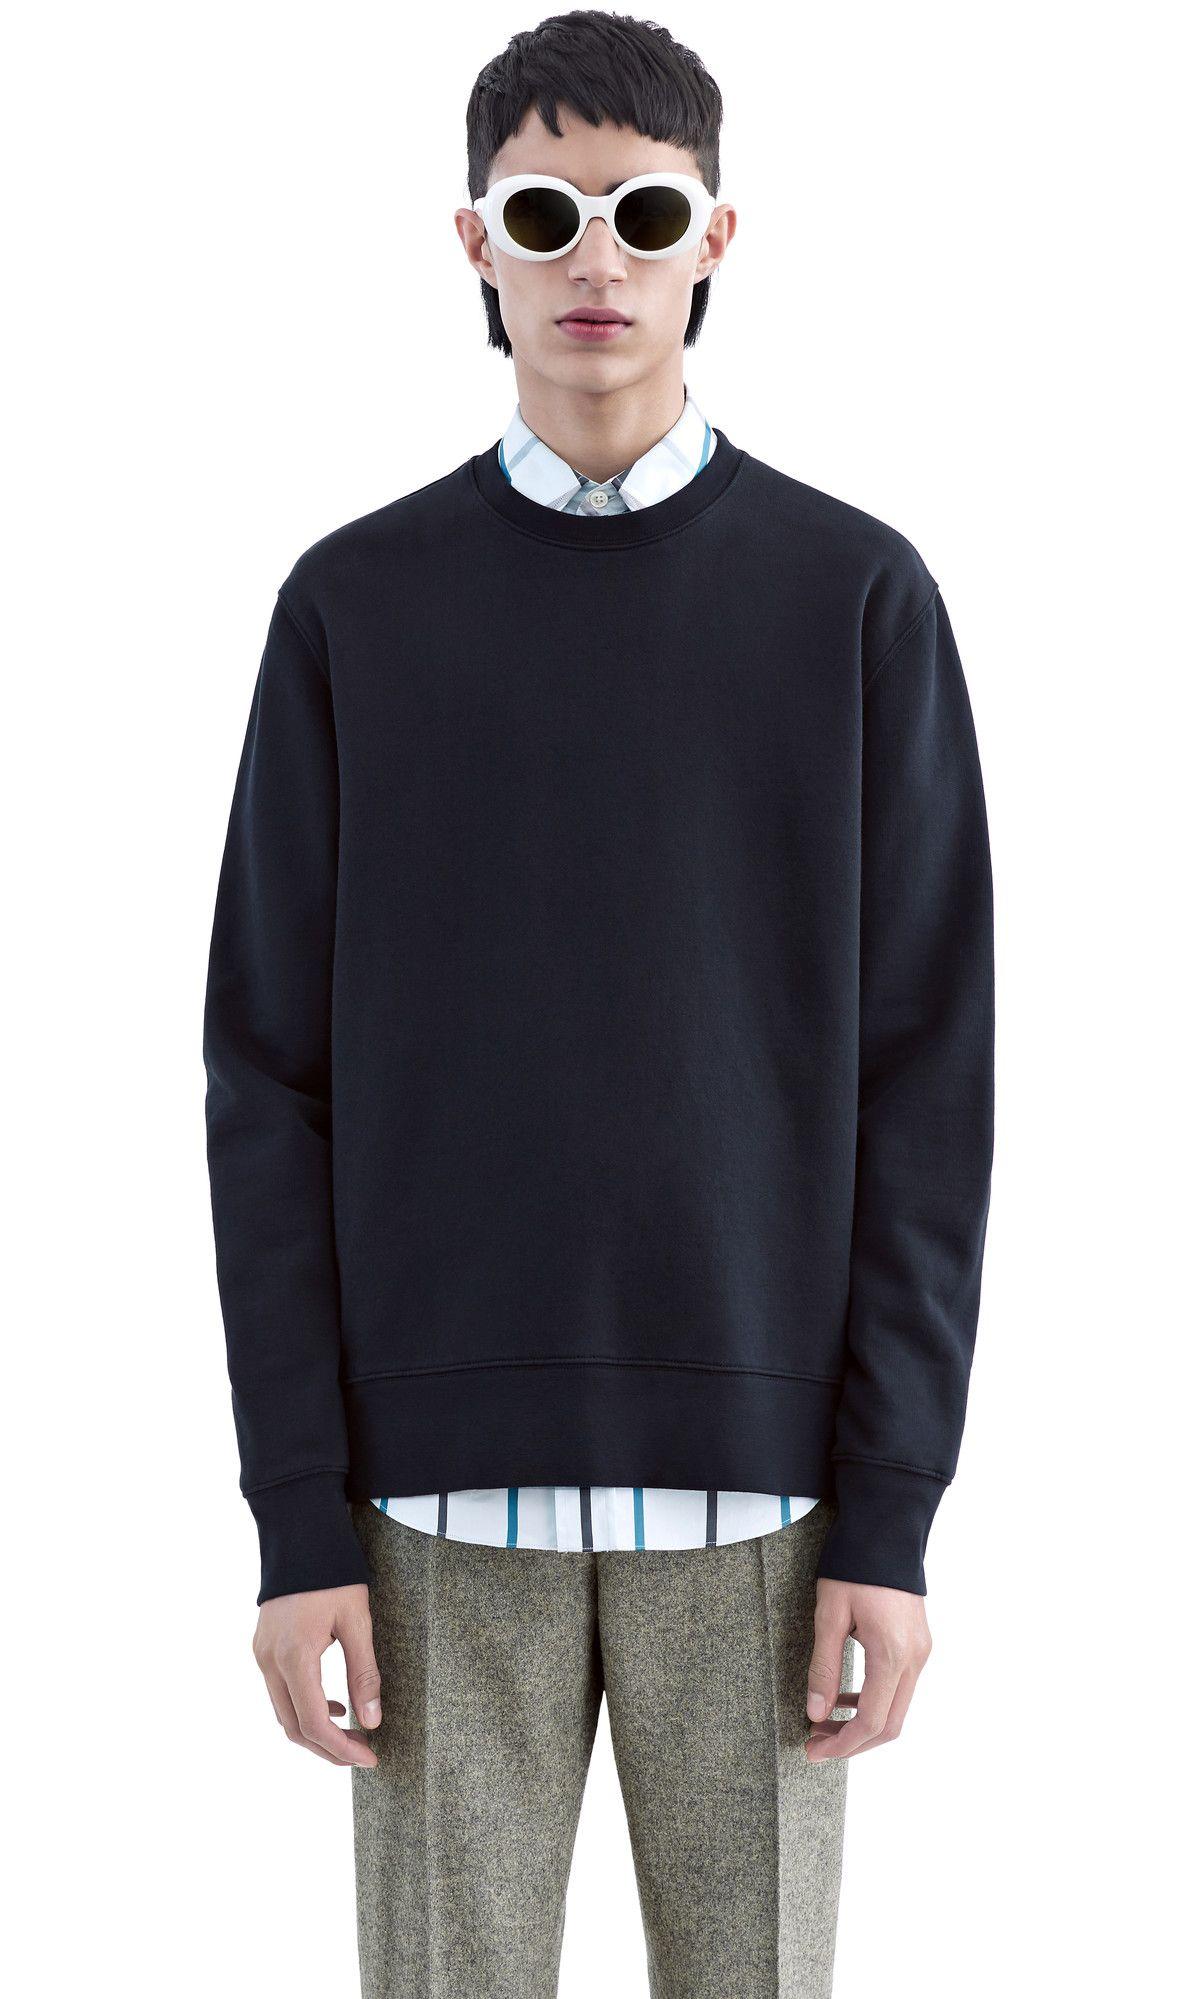 Acne studios pricey feminist sweatshirts